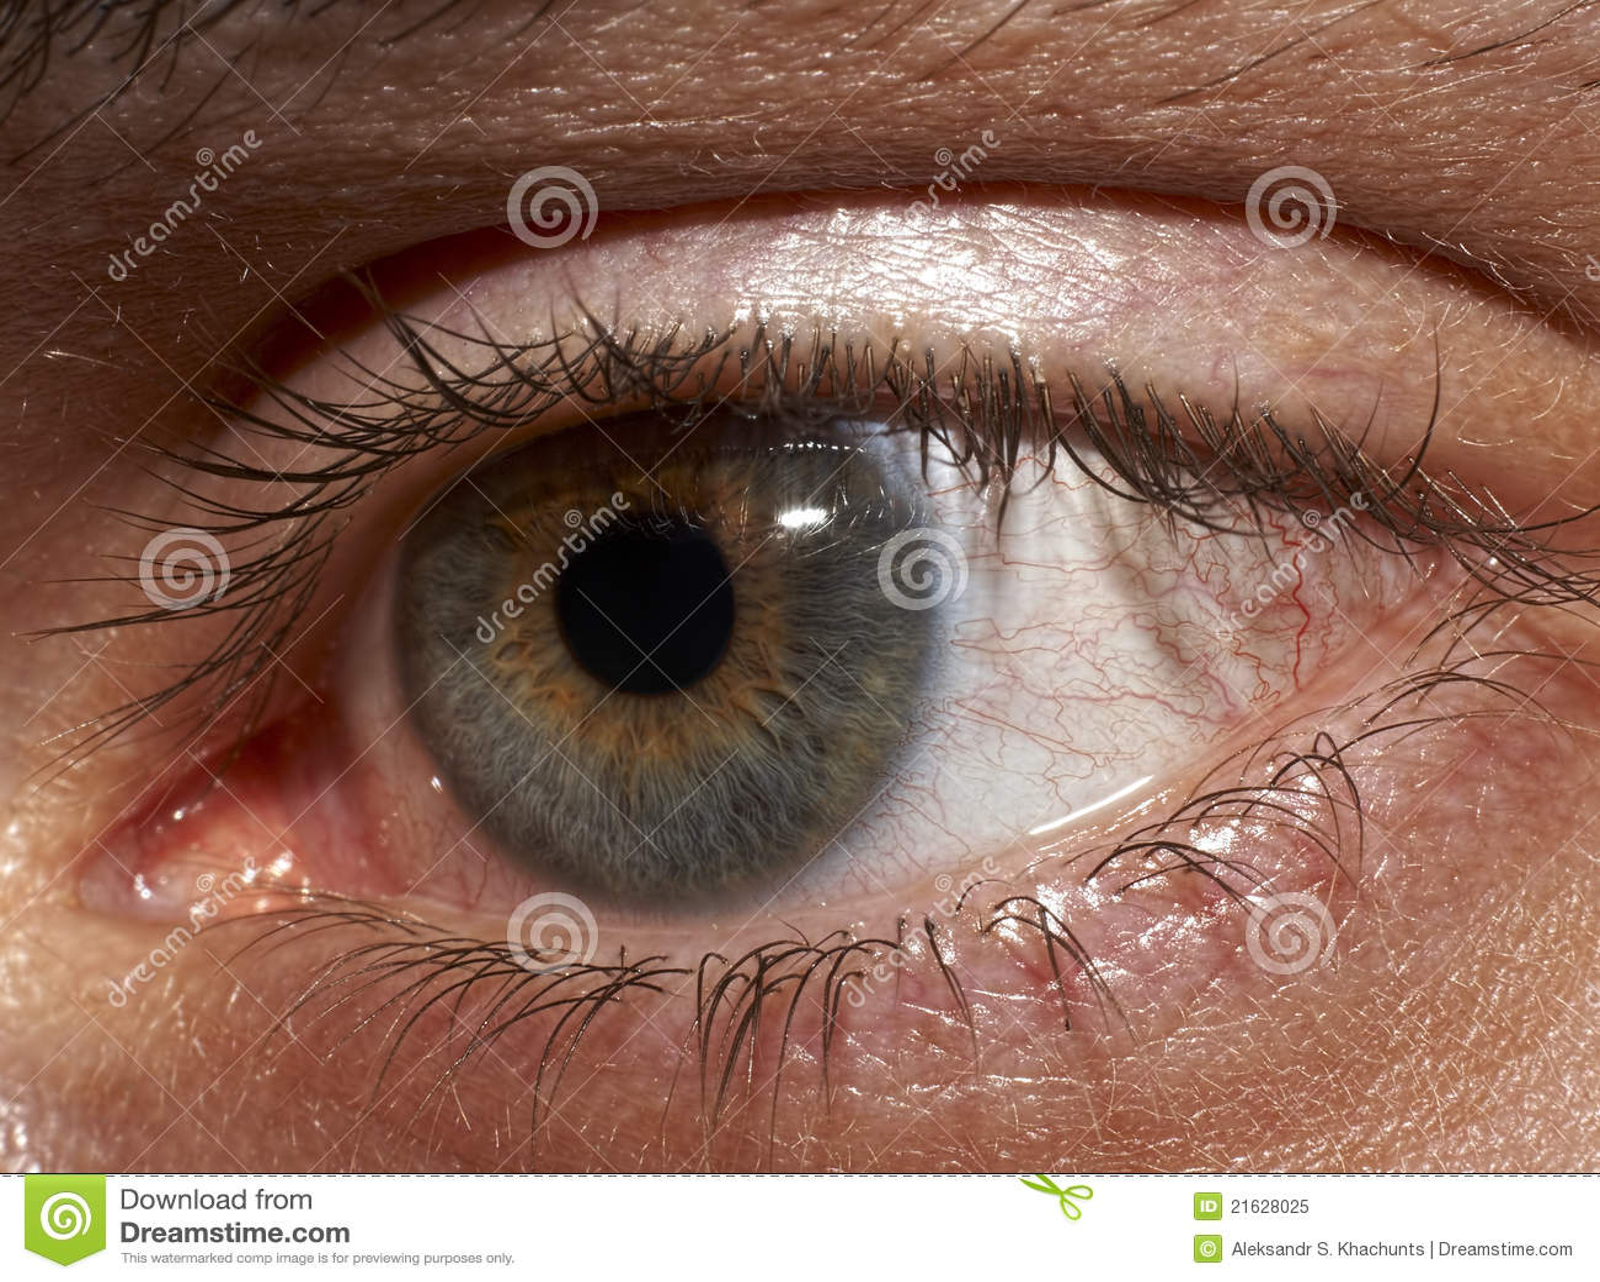 Anatomie Des Auges Stock Photos - Royalty Free Pictures